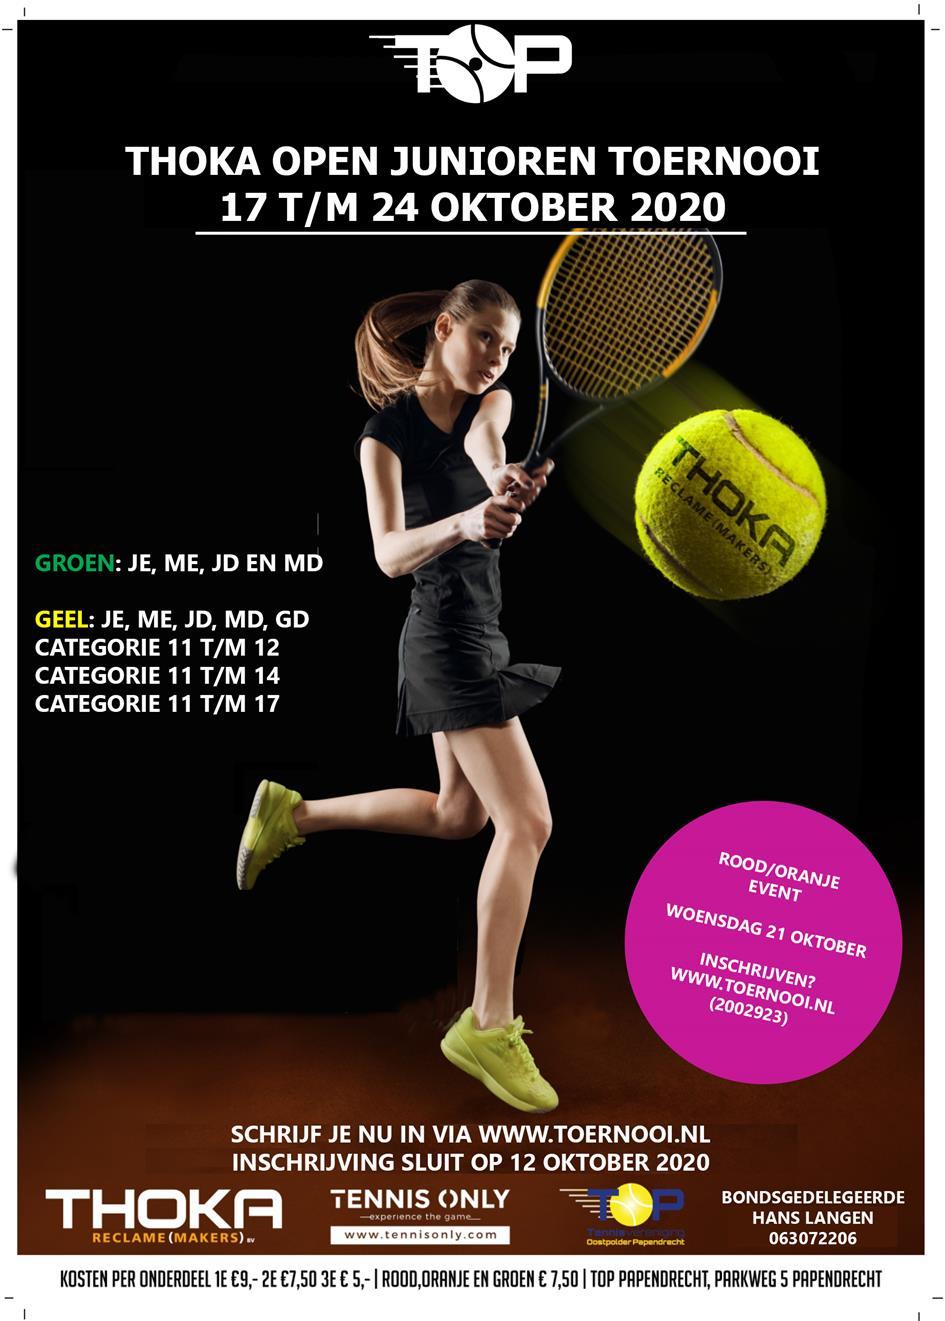 Thoka Juniorentoernooi 2020 a5[1095].jpg